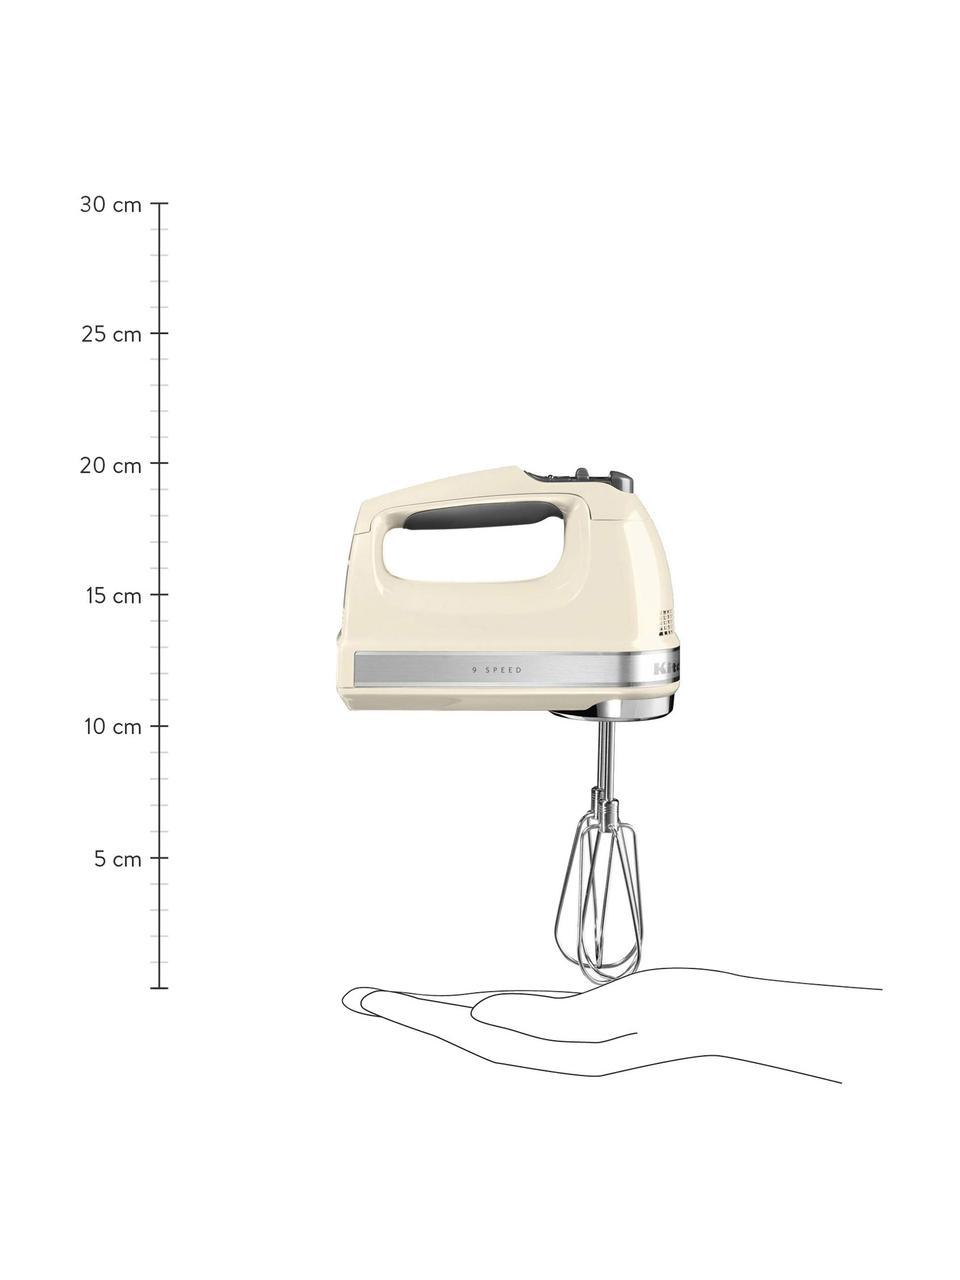 Handrührgerät KitchenAid, Gehäuse: Kunststoff., Creme, glänzend, 15 x 20 cm